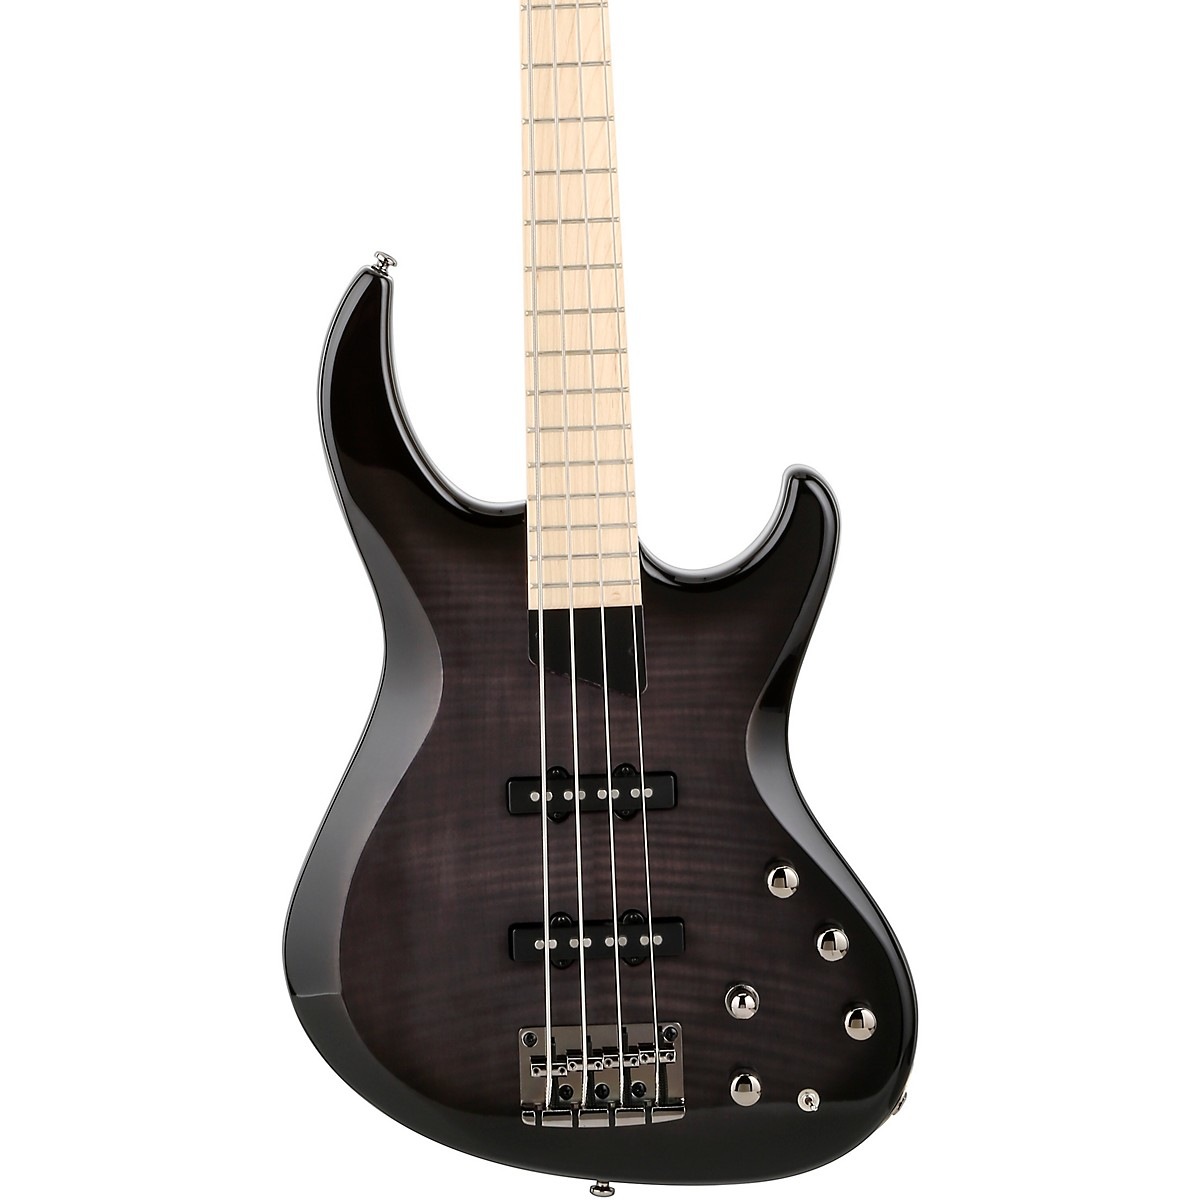 MTD Kingston Saratoga Deluxe Electric Bass